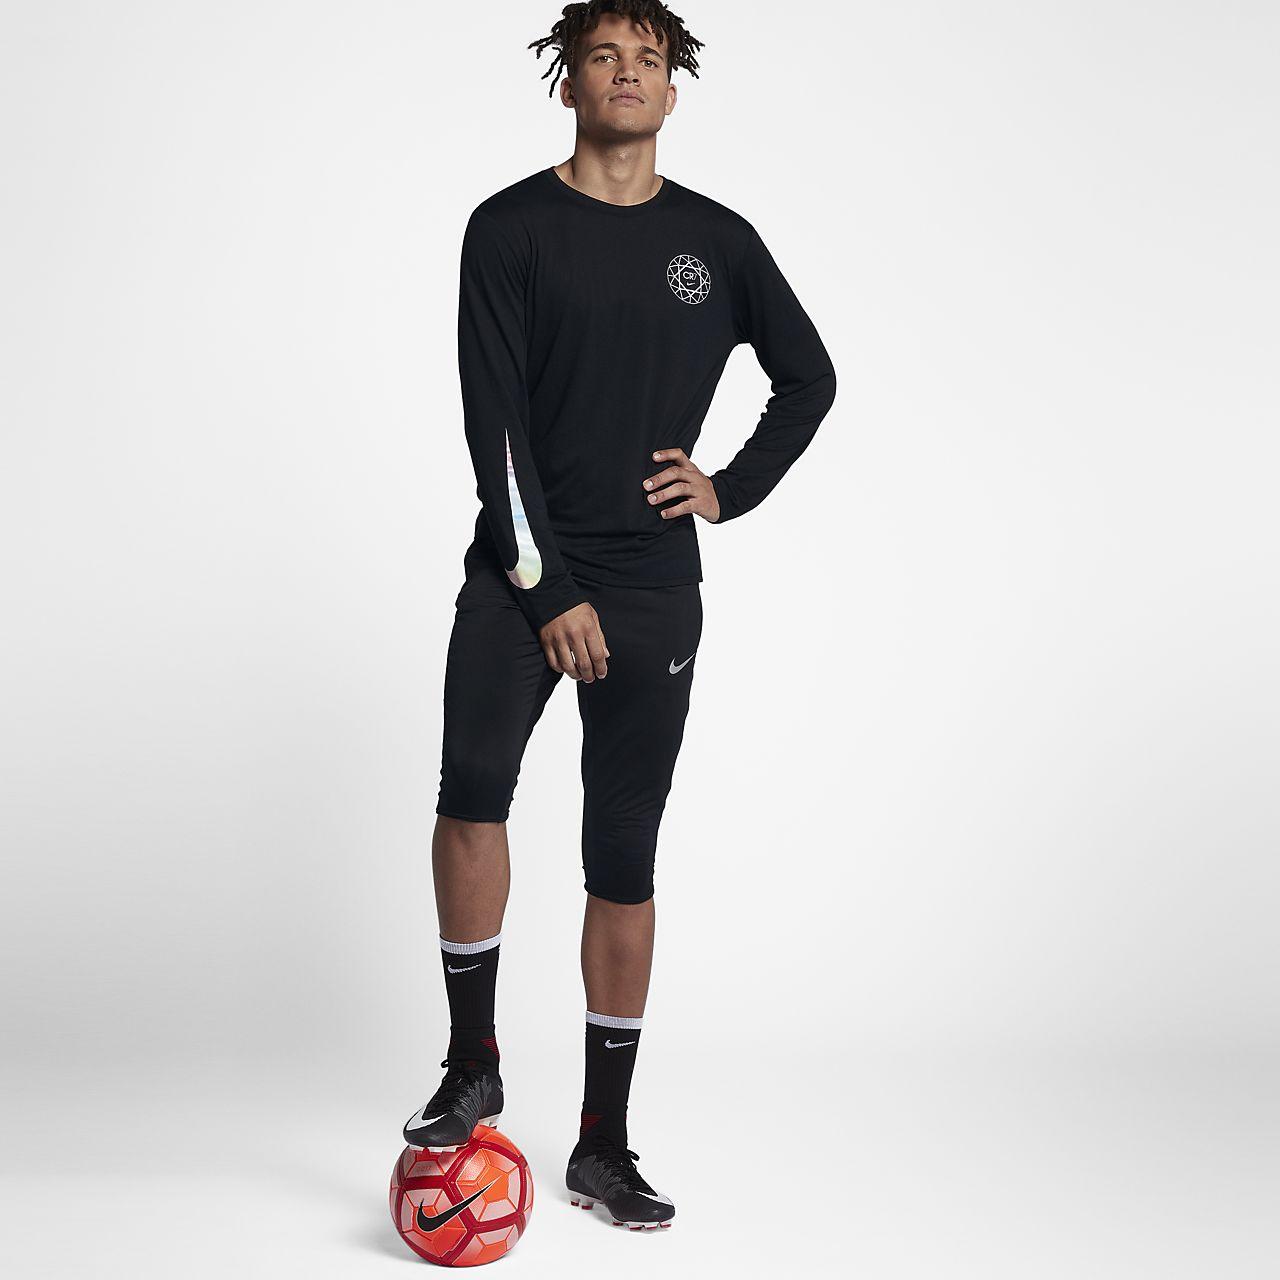 size 40 56b9a 8e739 Nike Dry CR7 Men's Long-Sleeve T-Shirt